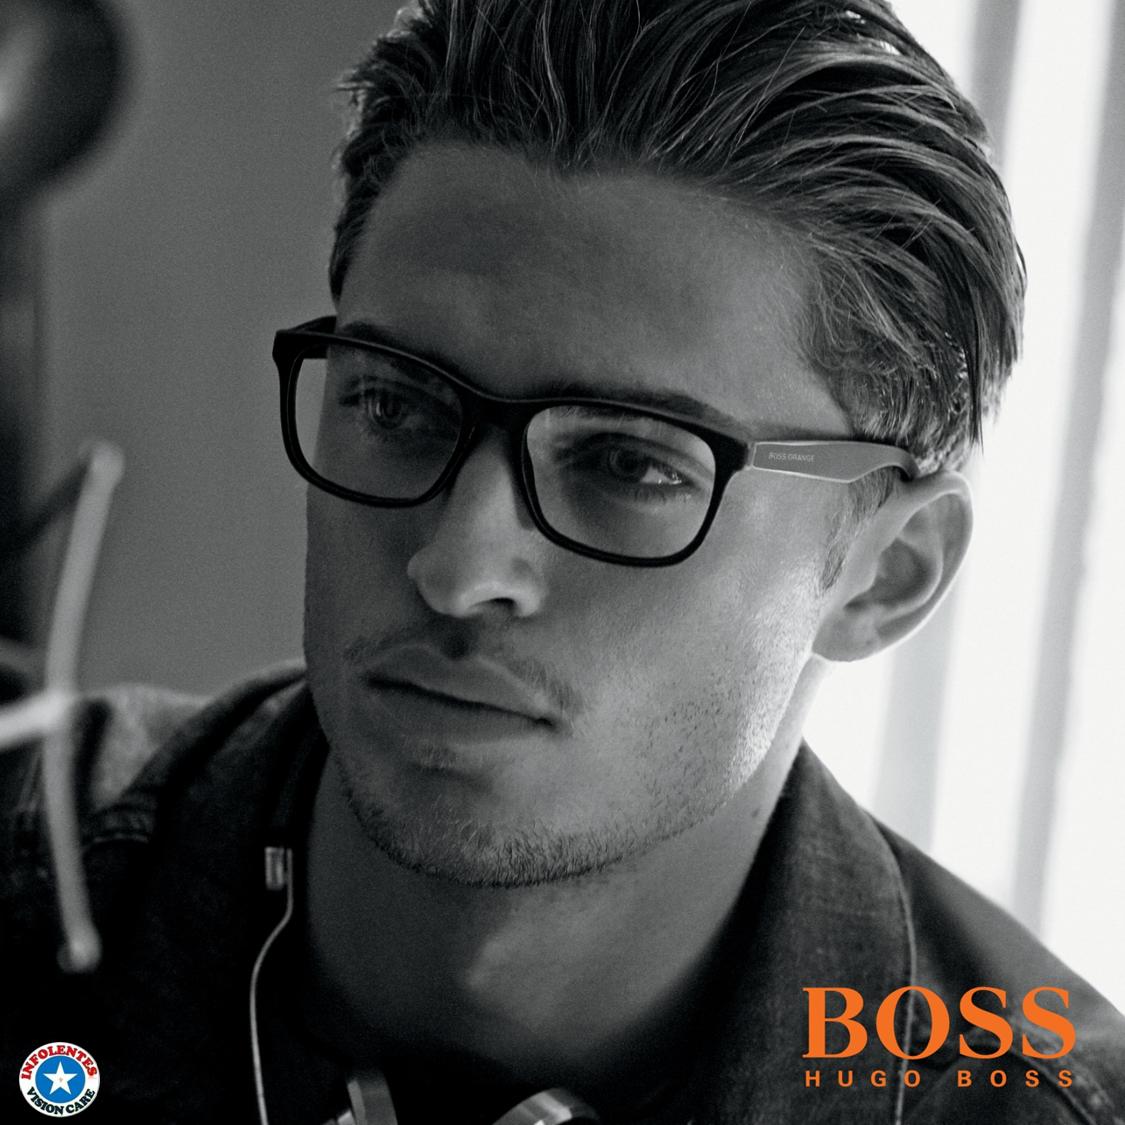 Hugo Boss ventas al :